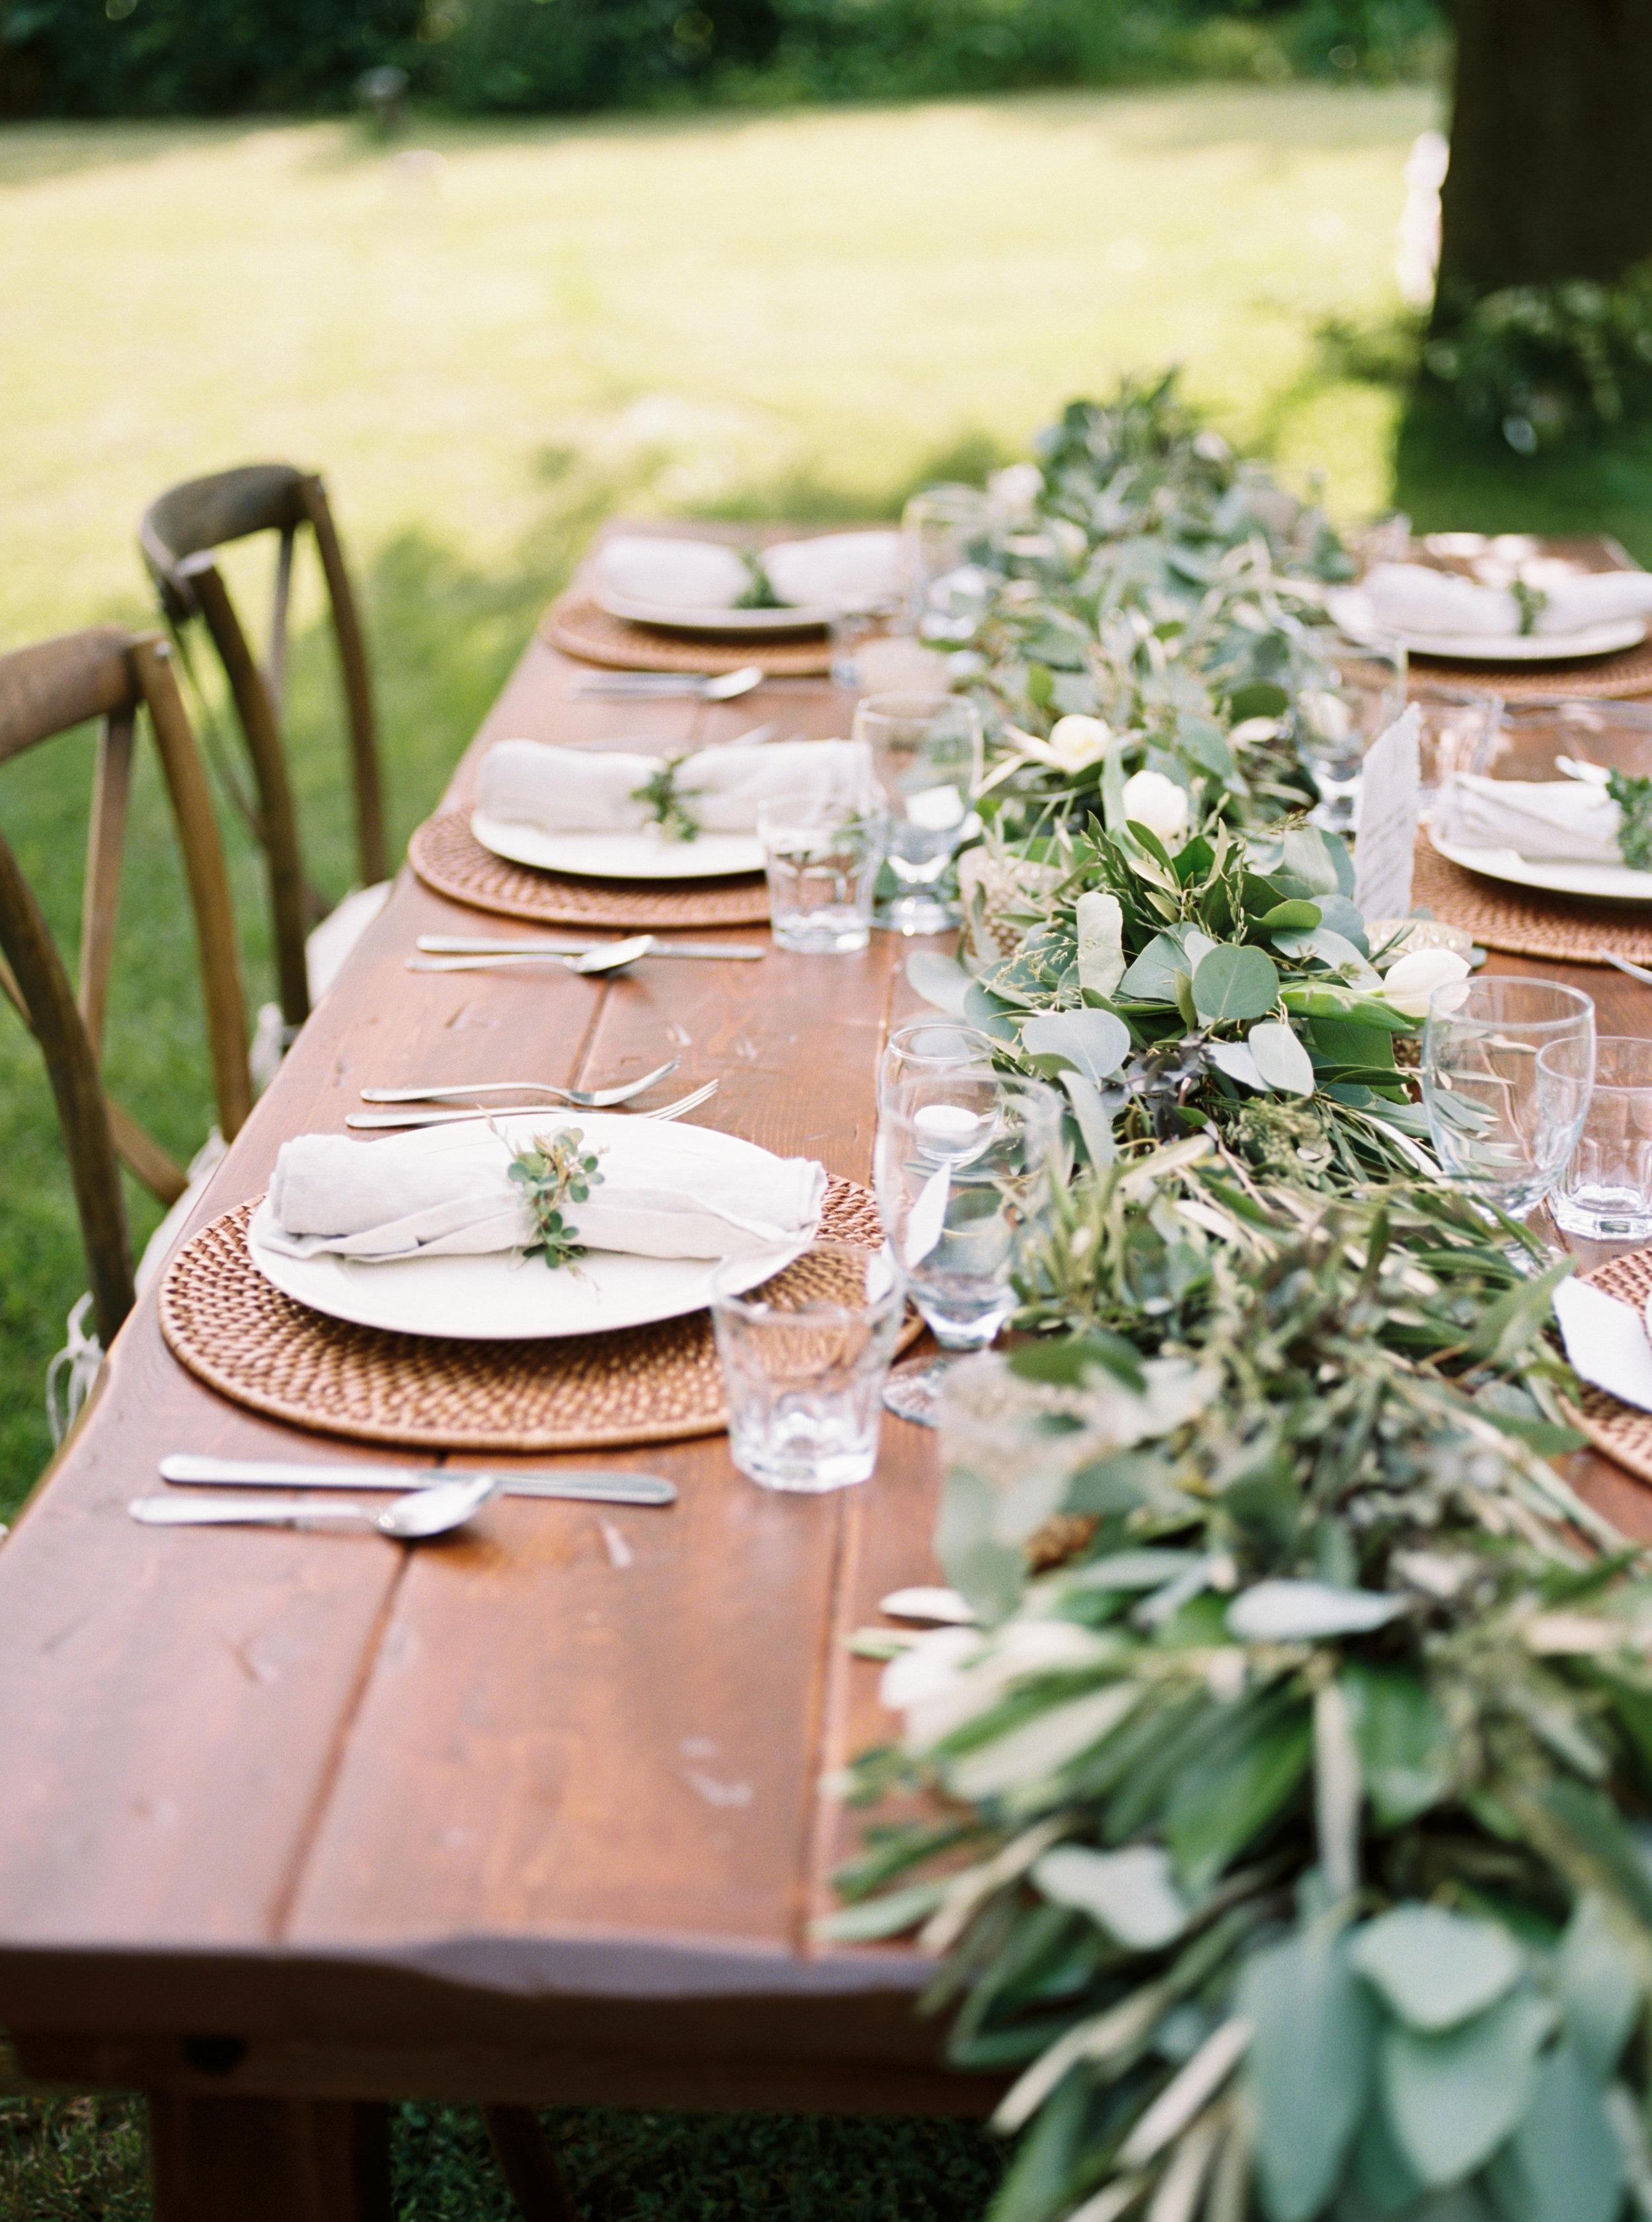 greenhouse-wedding-inspiration-by-laurelyn-savannah-photography-20.jpg